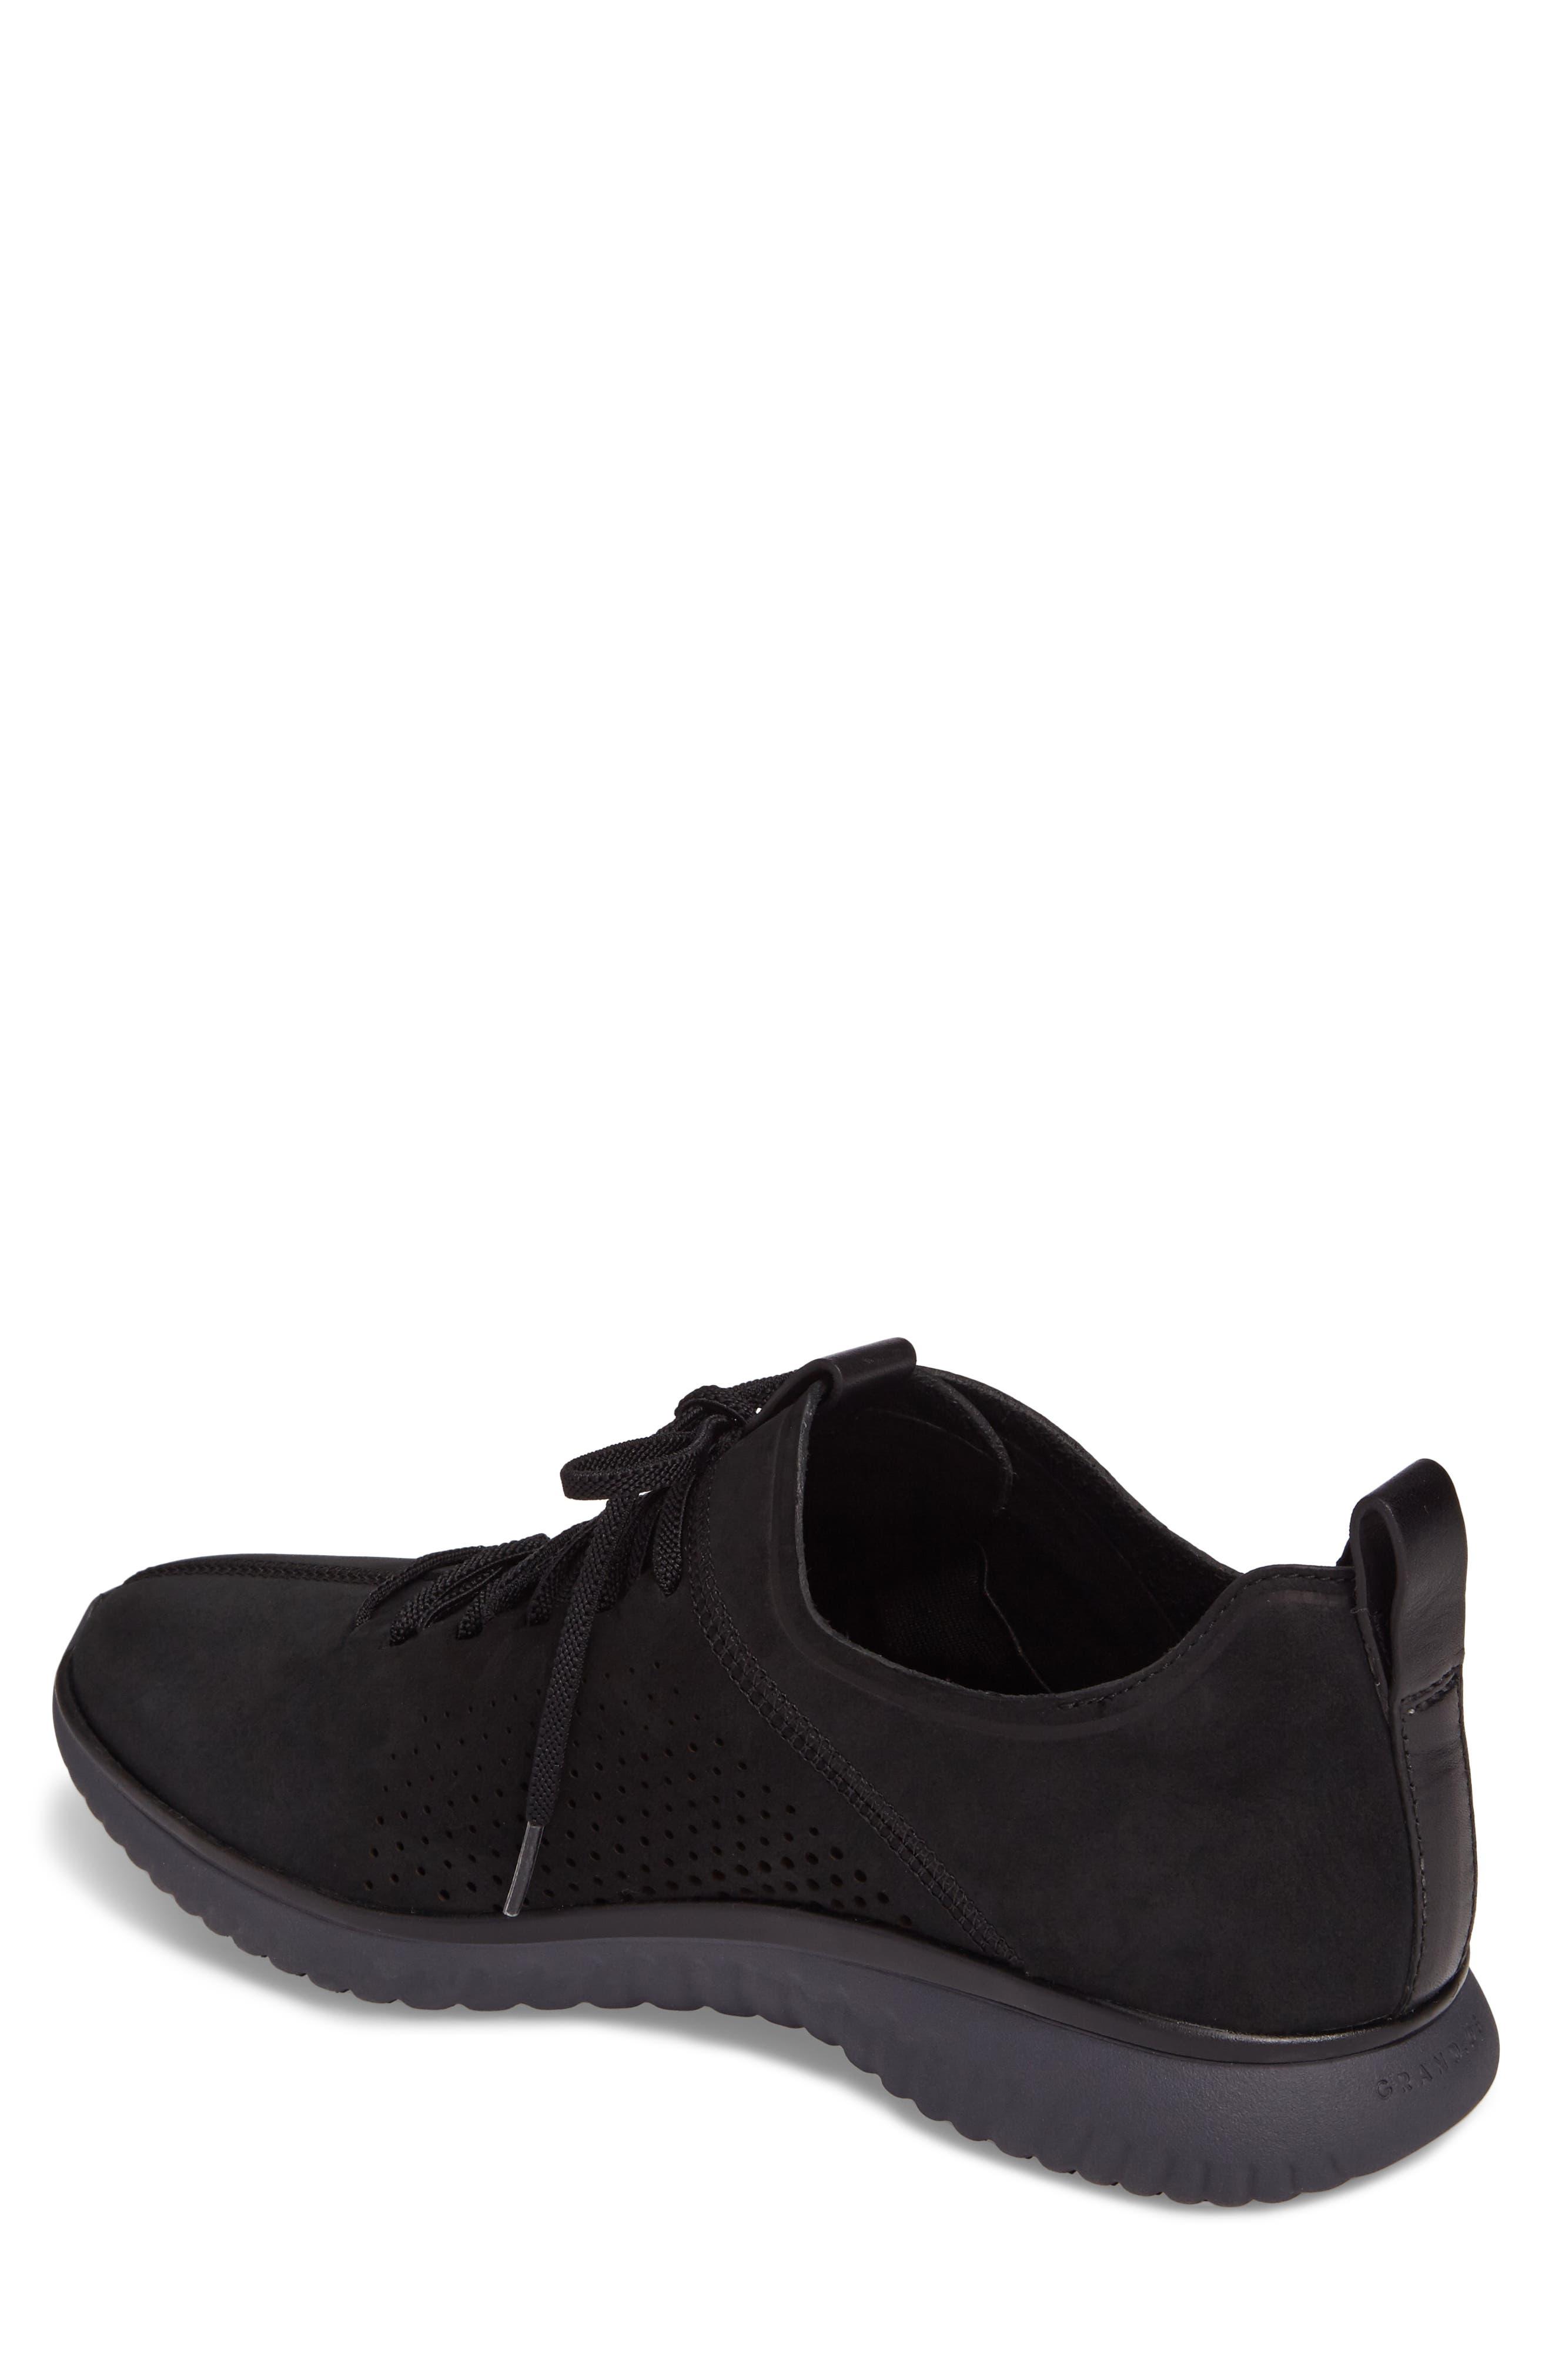 2.ZeroGrand Sneaker,                             Alternate thumbnail 2, color,                             001